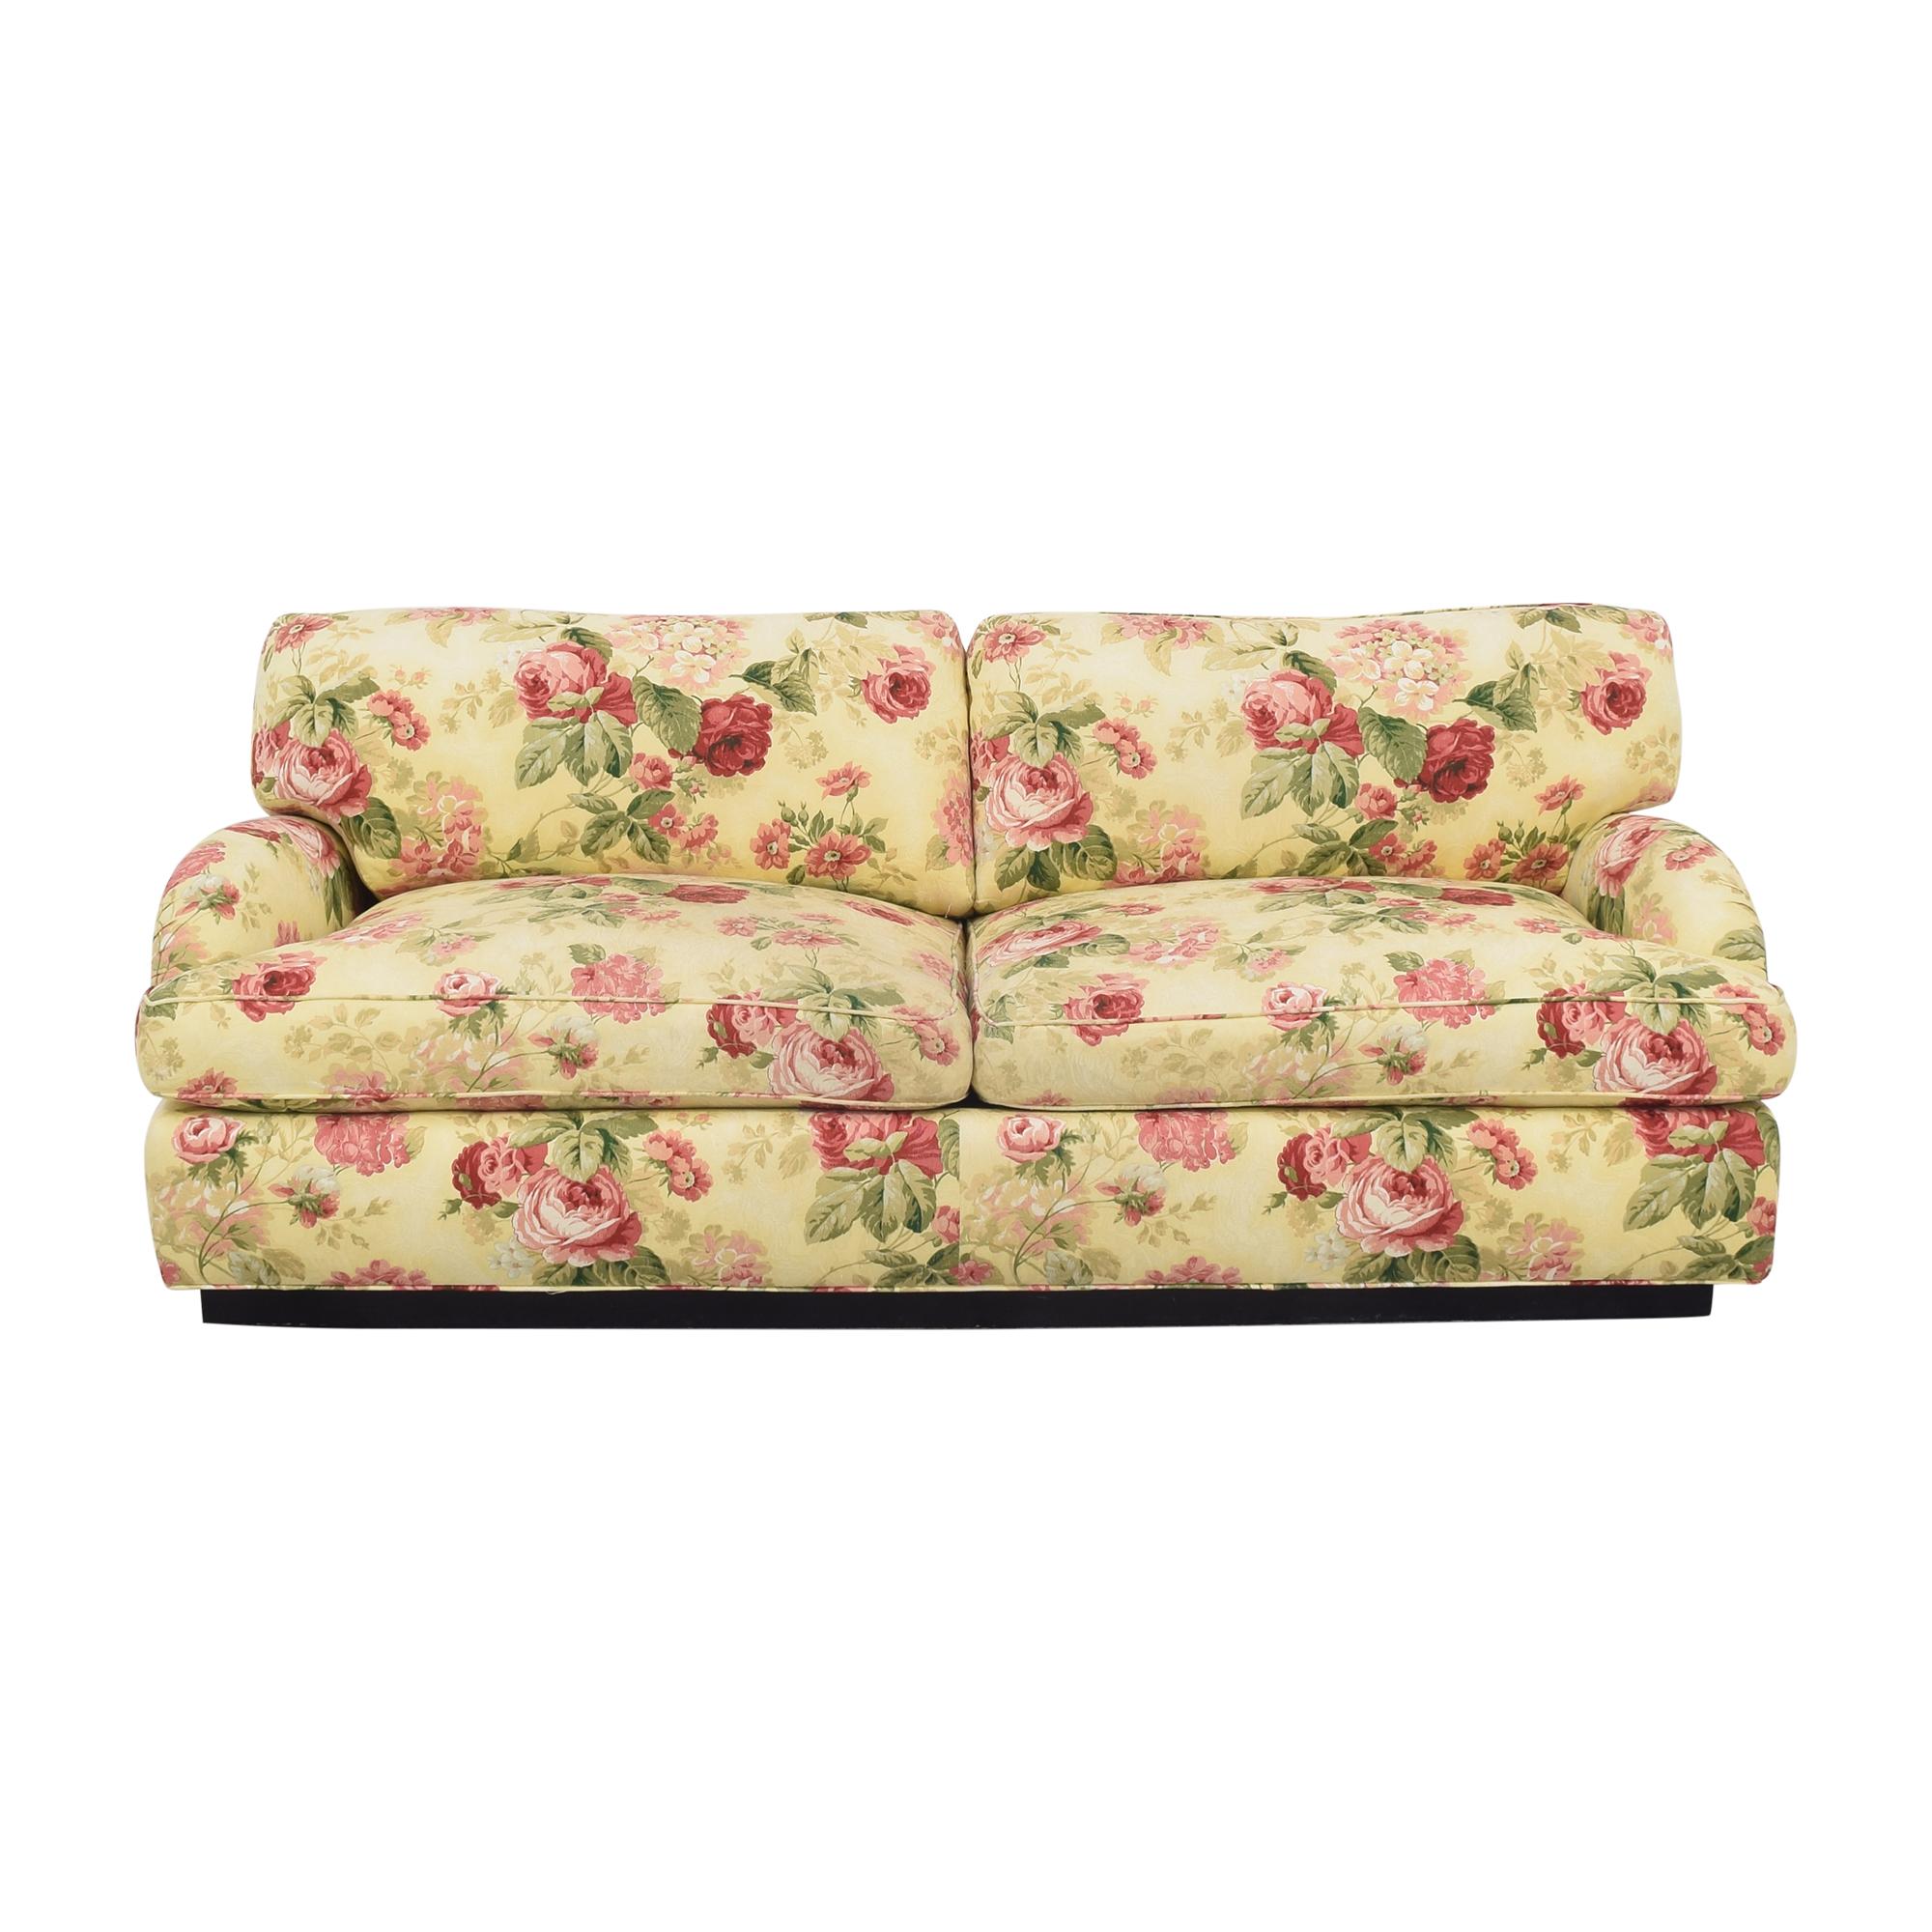 Greenbaum Interiors Greenbaum Two Cushion Sofa Classic Sofas